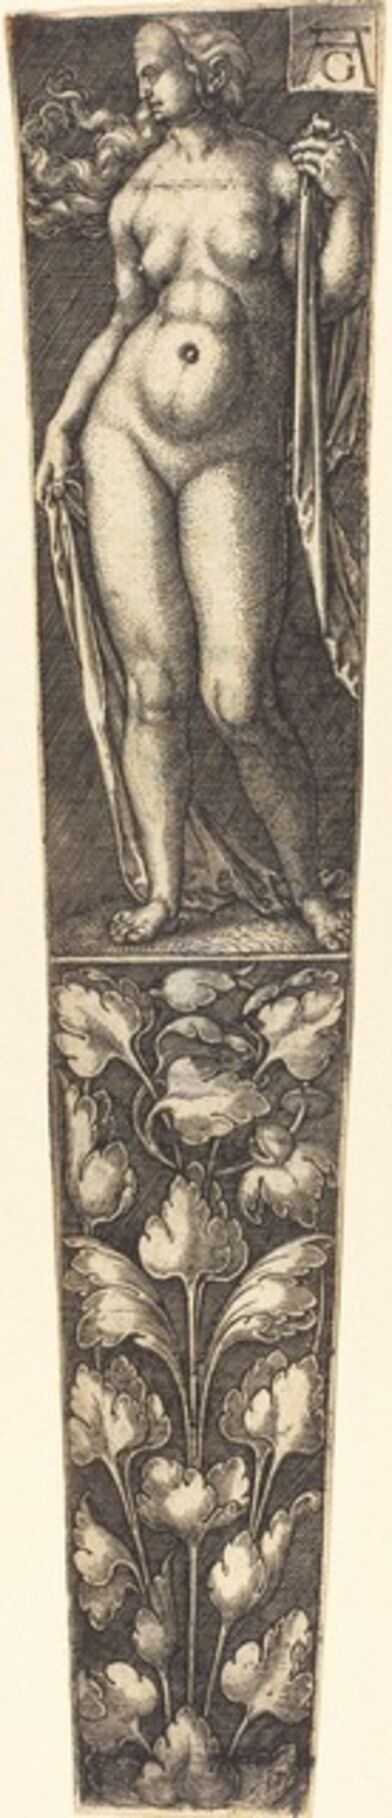 Heinrich Aldegrever, 'Dagger Sheath with Nude Woman'